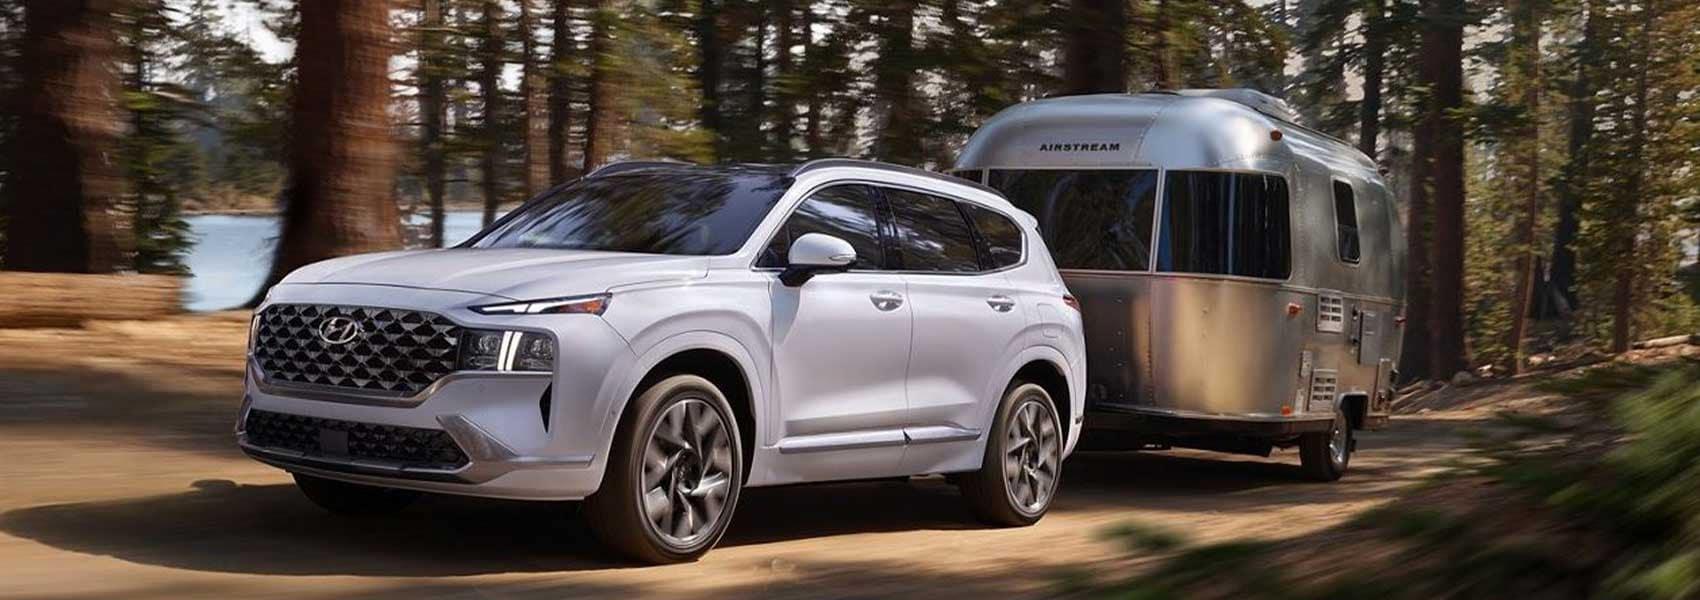 The New 2021 Hyundai Santa Fe